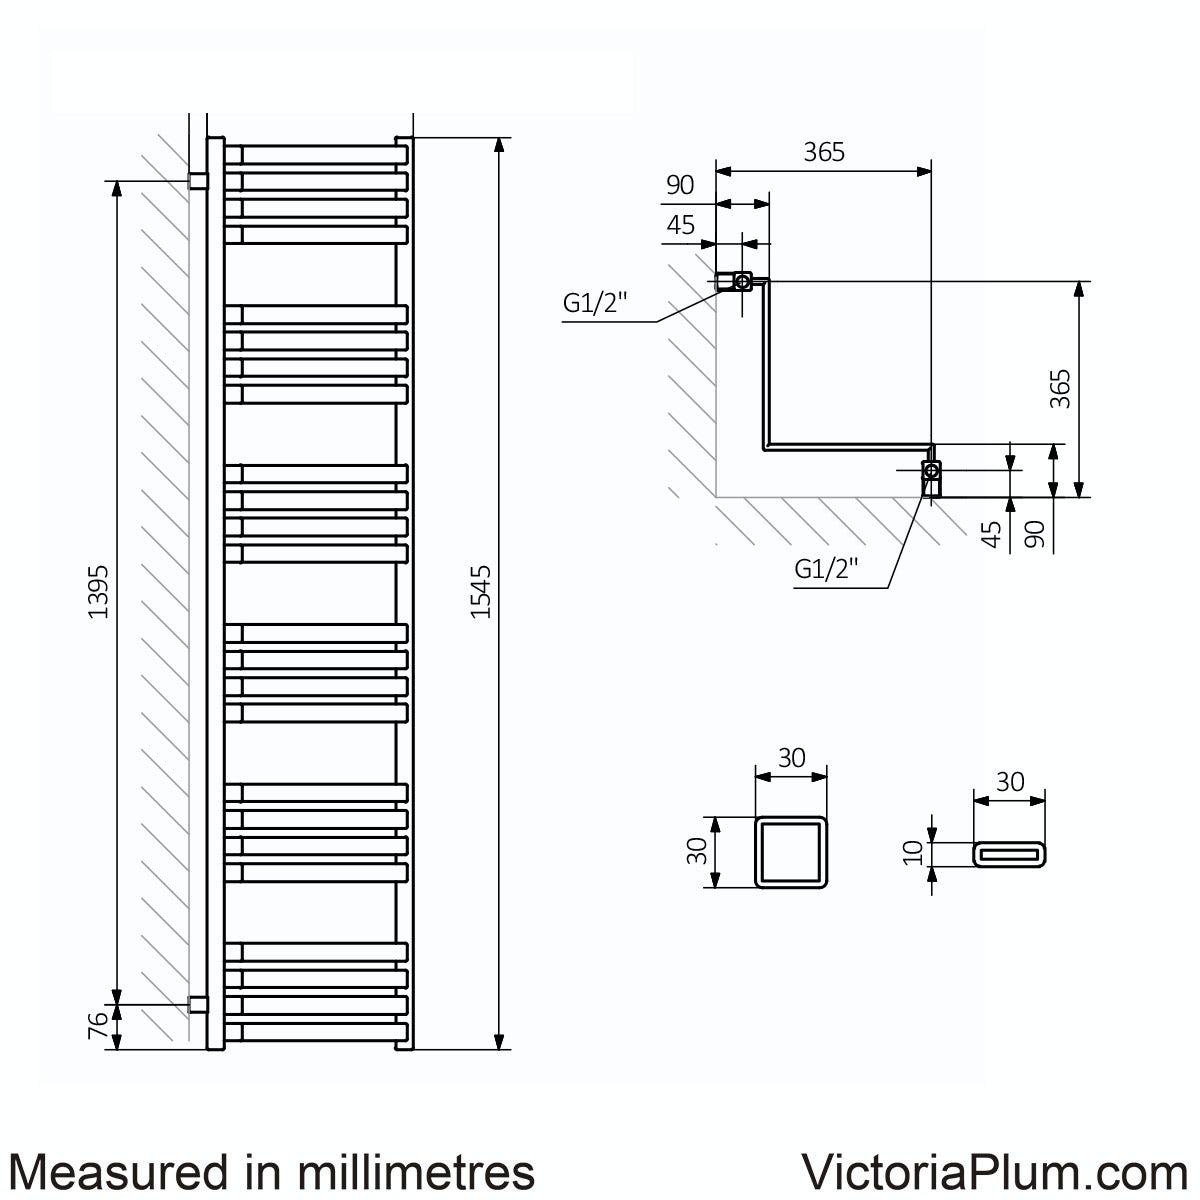 Dimensions for Terma Incorner modern grey heated towel rail 1545 x 350